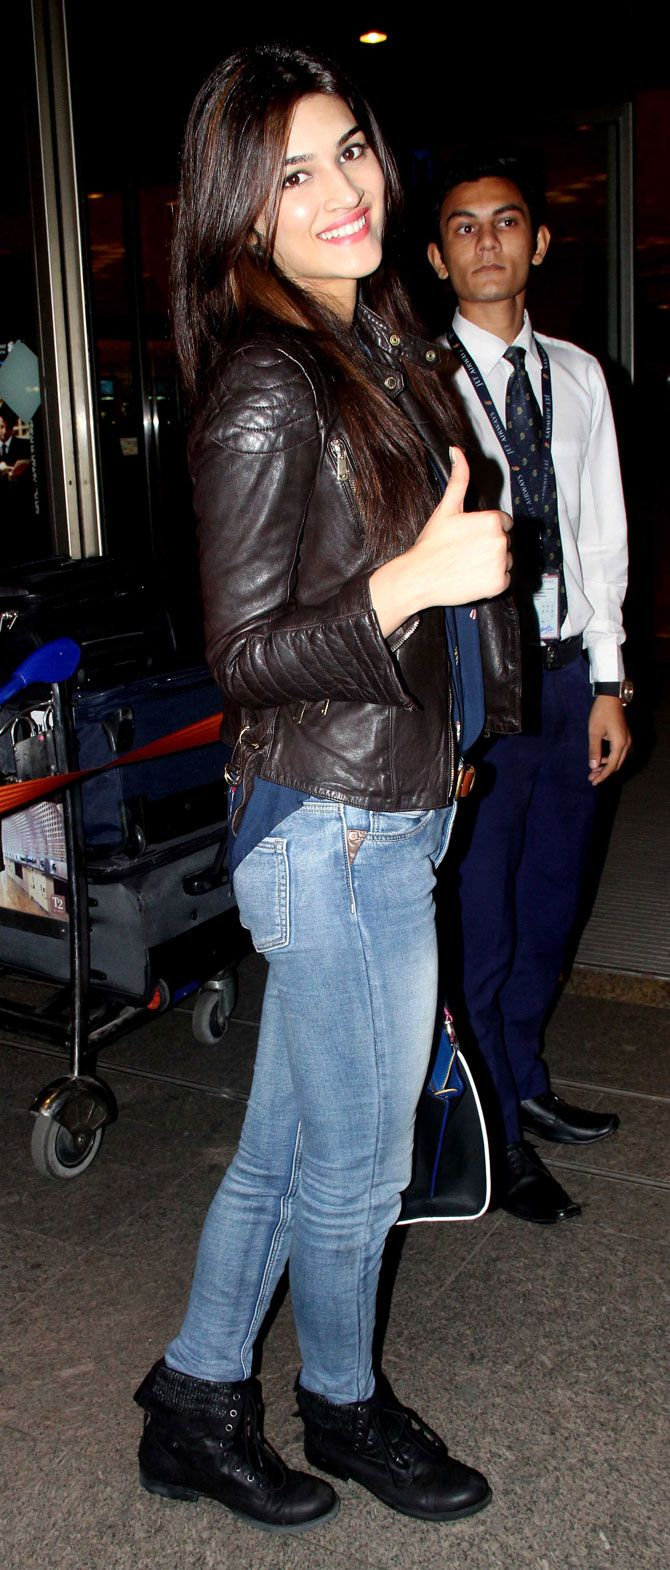 Kriti Sanon at Mumbai airport. #Bollywood #Fashion #Style #Beauty #Hot #Sexy